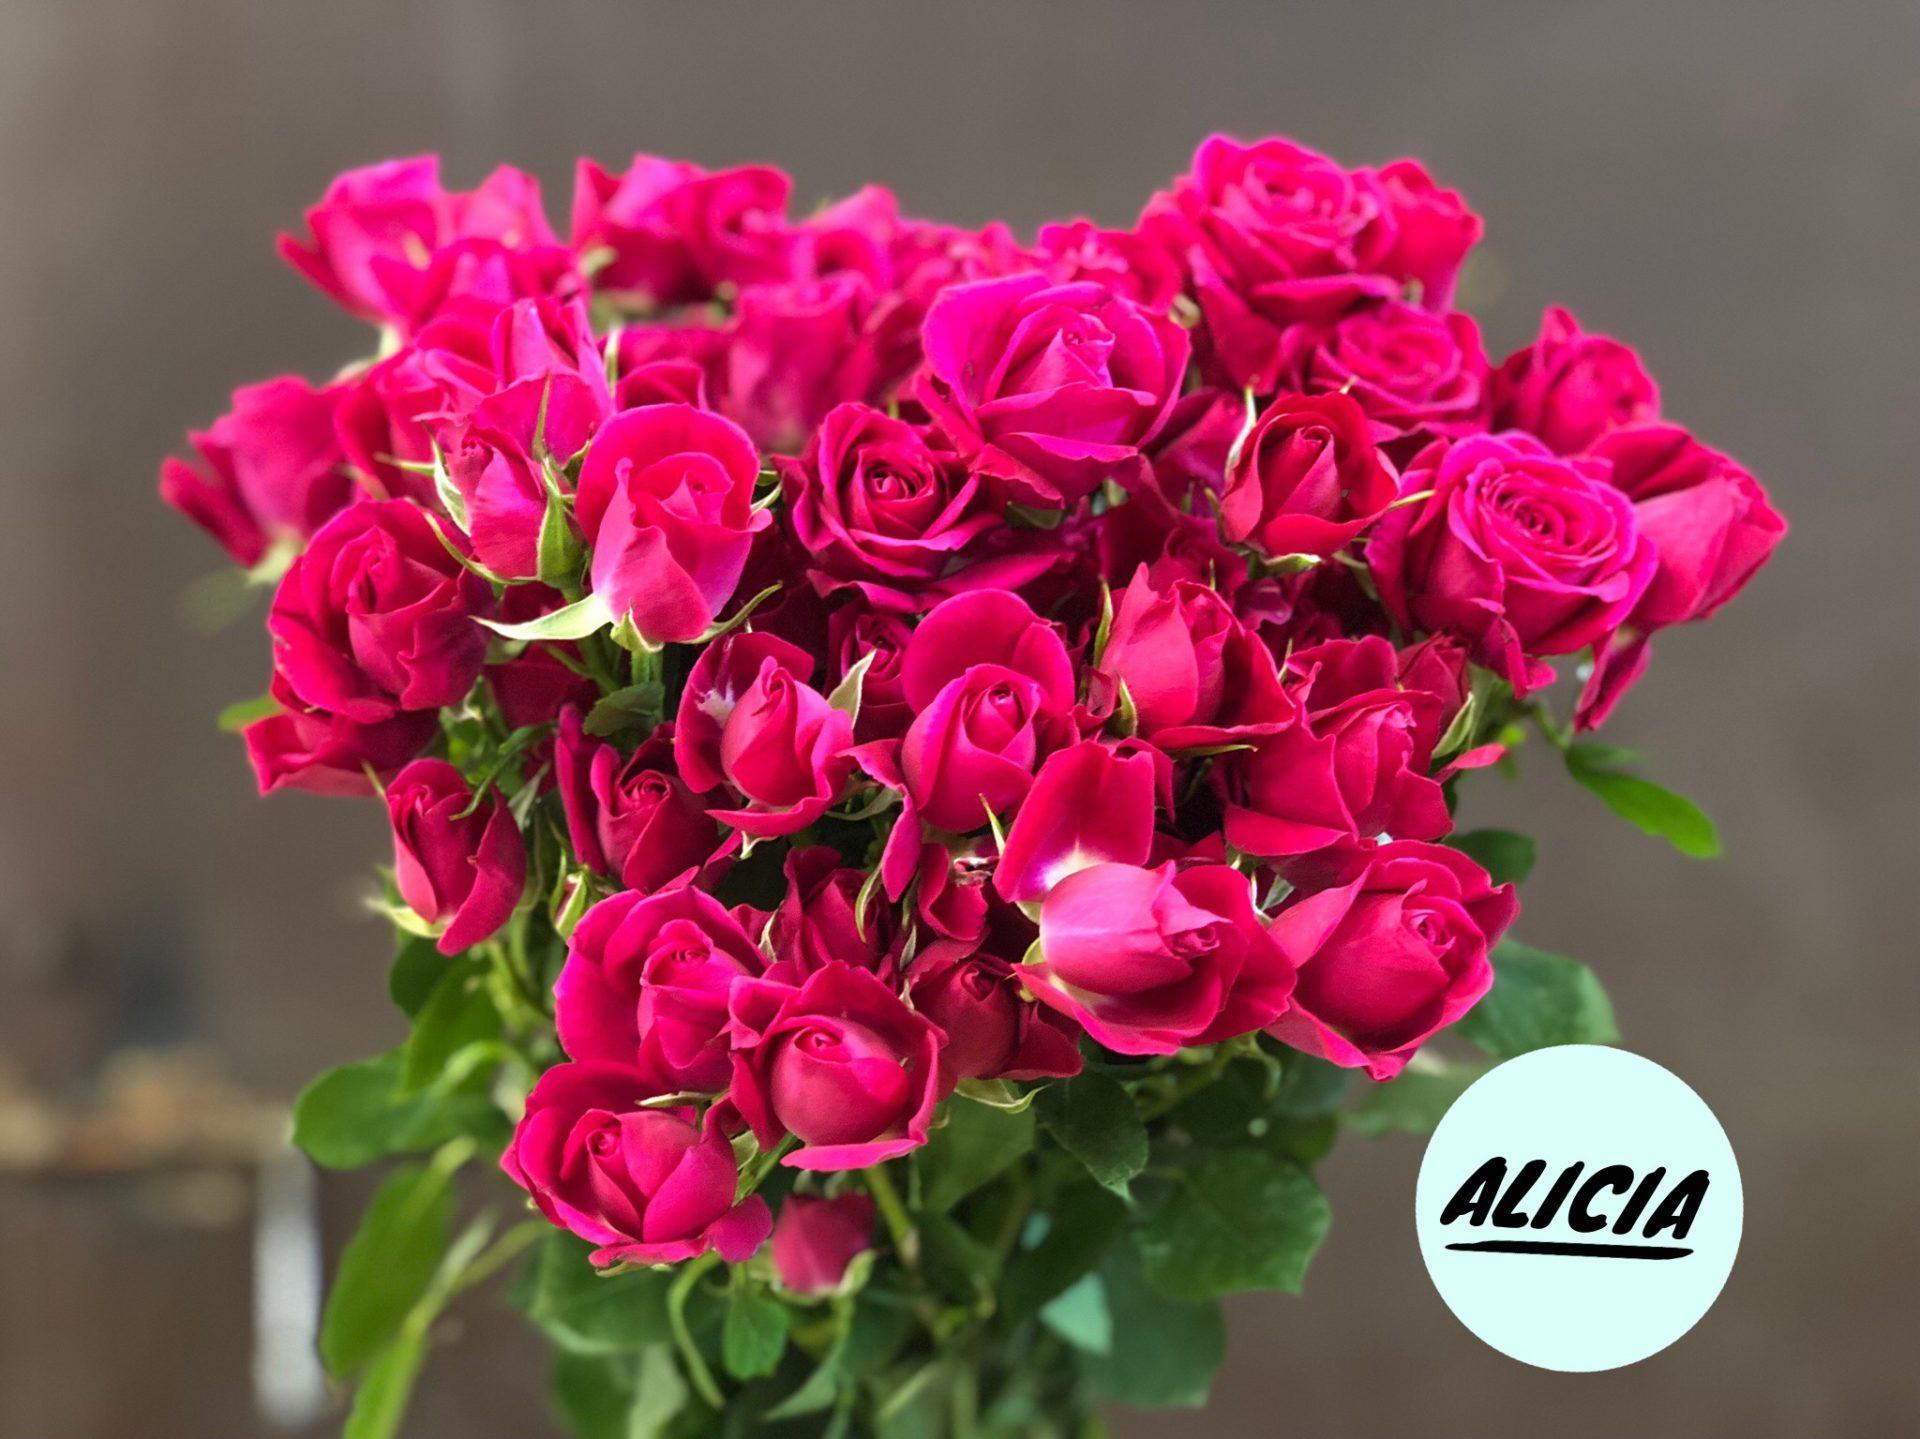 Роза Алисия изображение 1